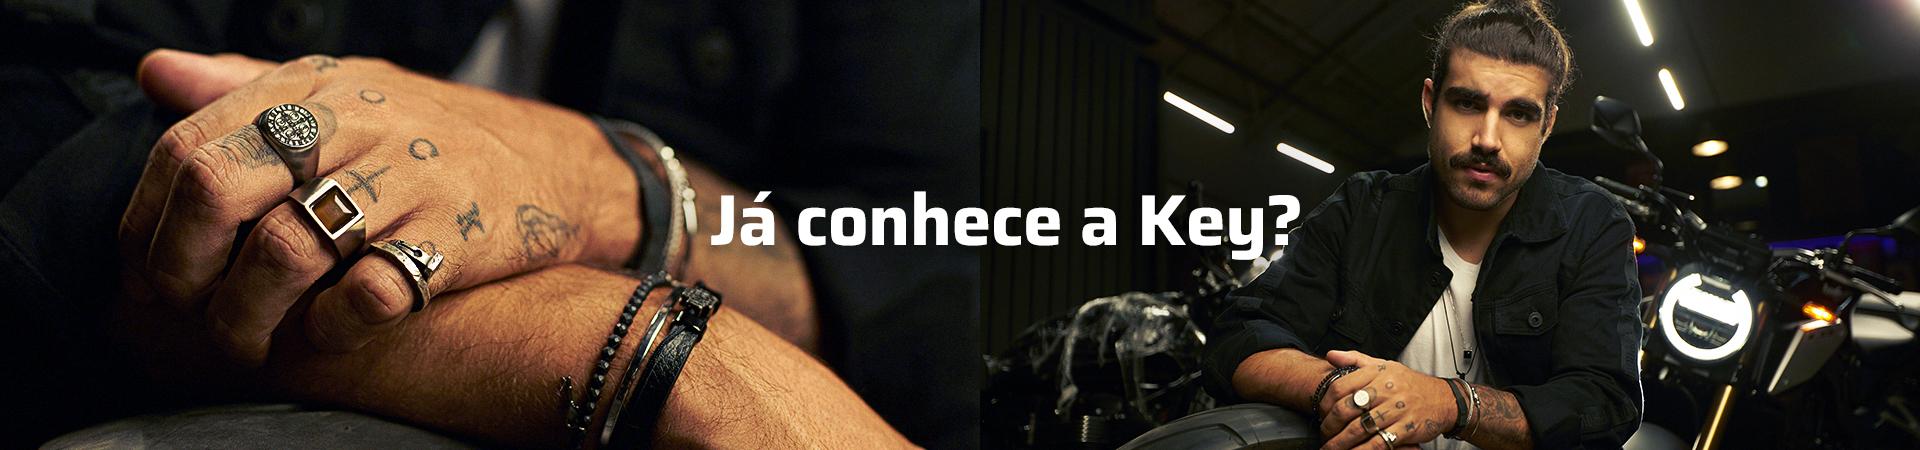 FULL - Banner Conhece a Key DESK